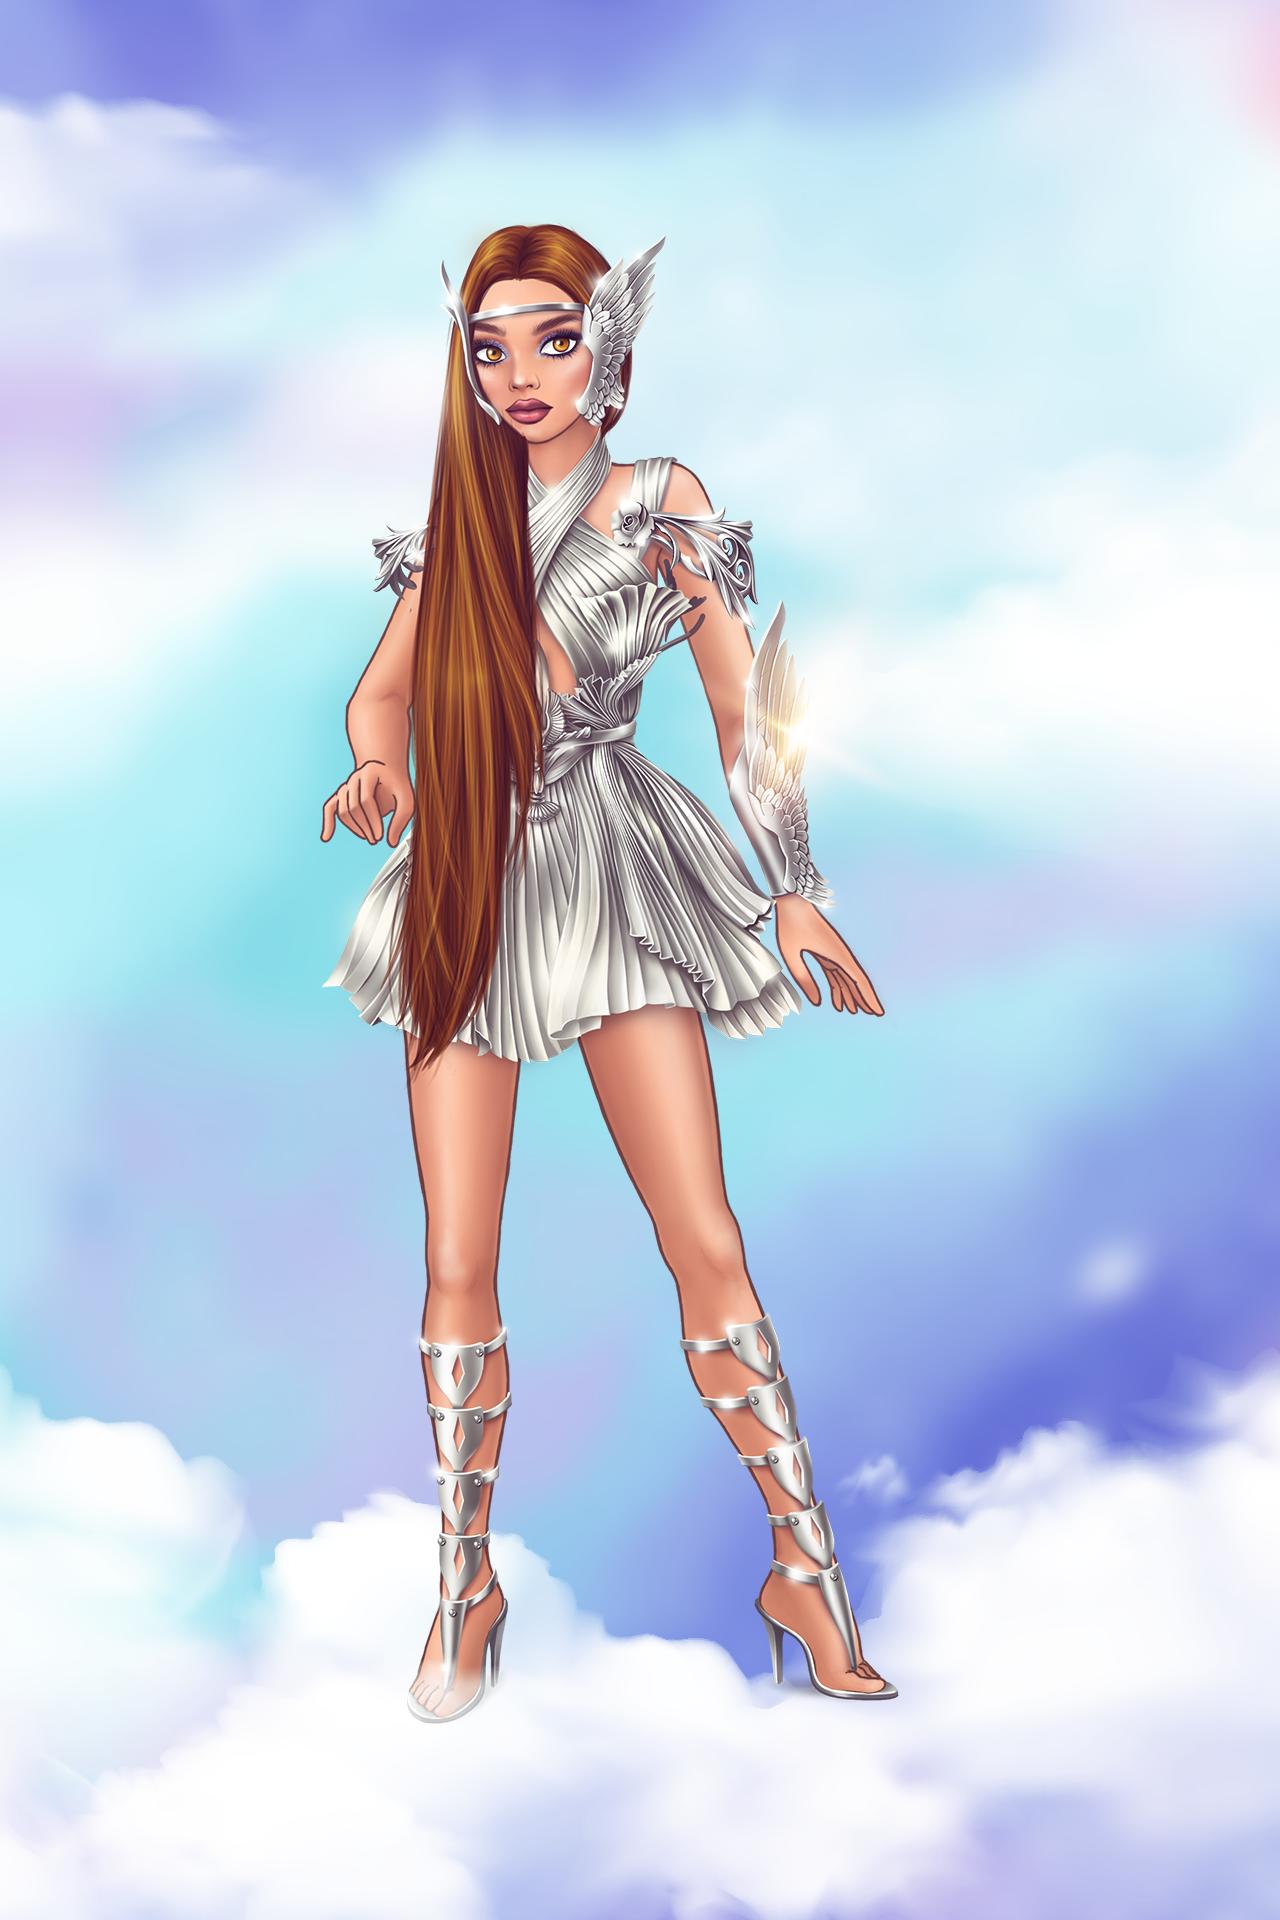 Event Goddesses ladypopular ladypopularfashionarena